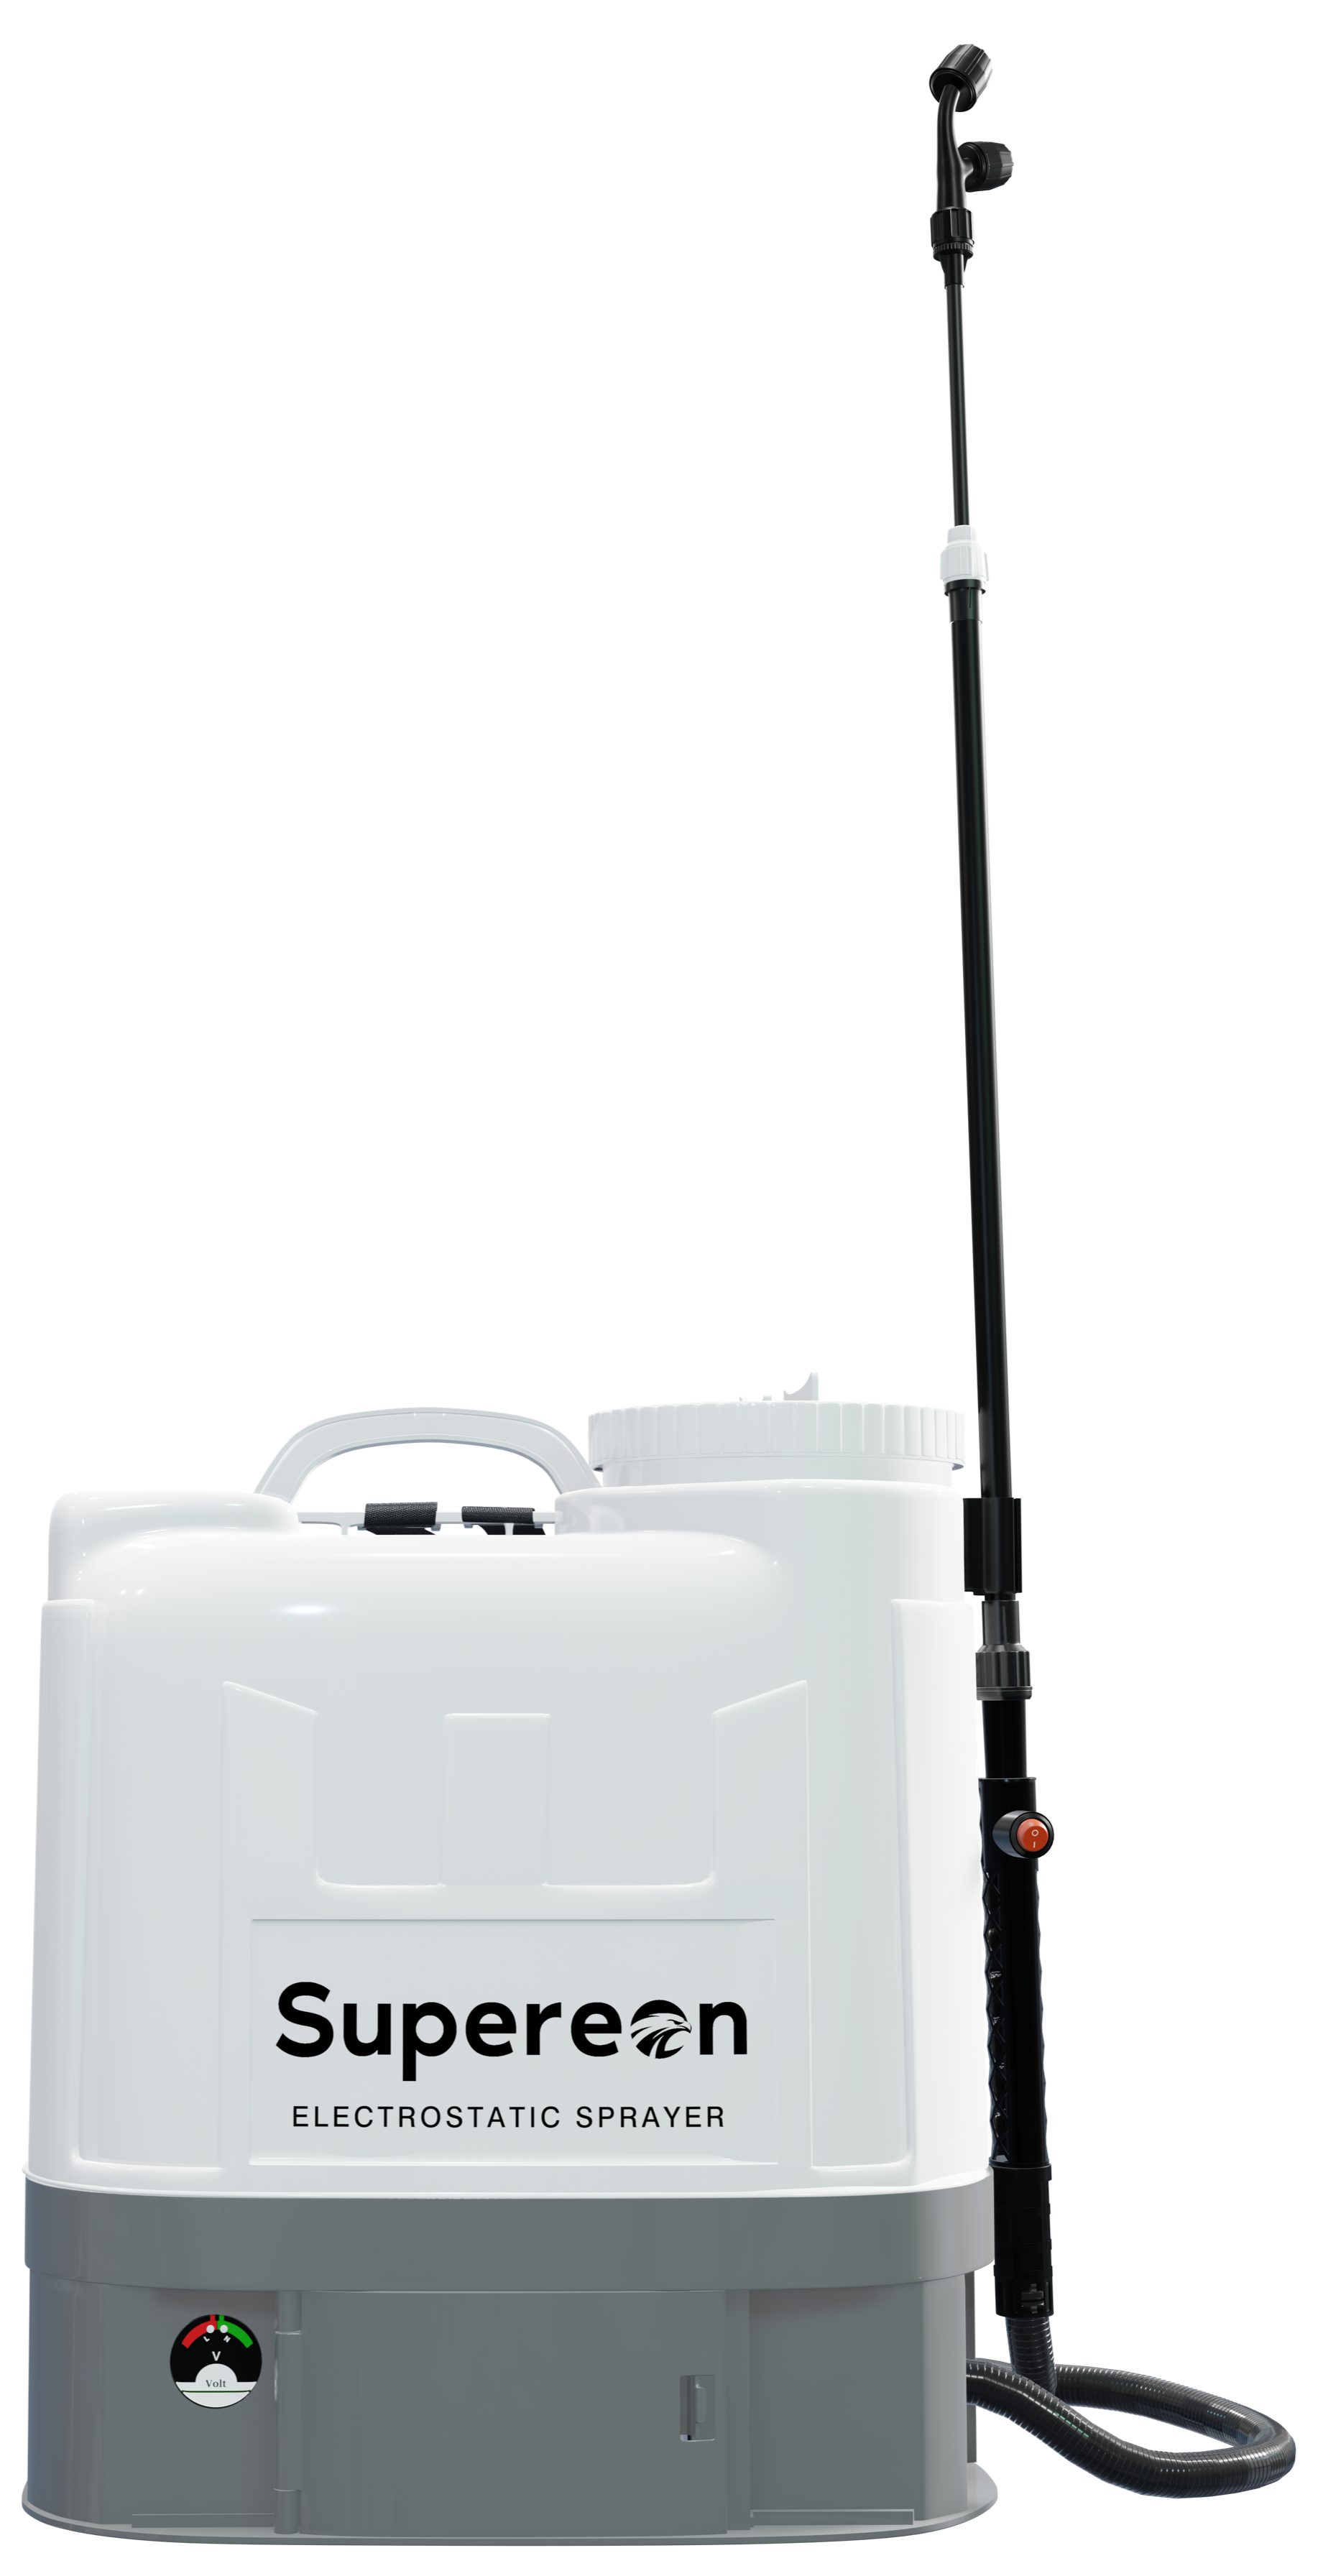 Supereon- Disinfectant Sprayer